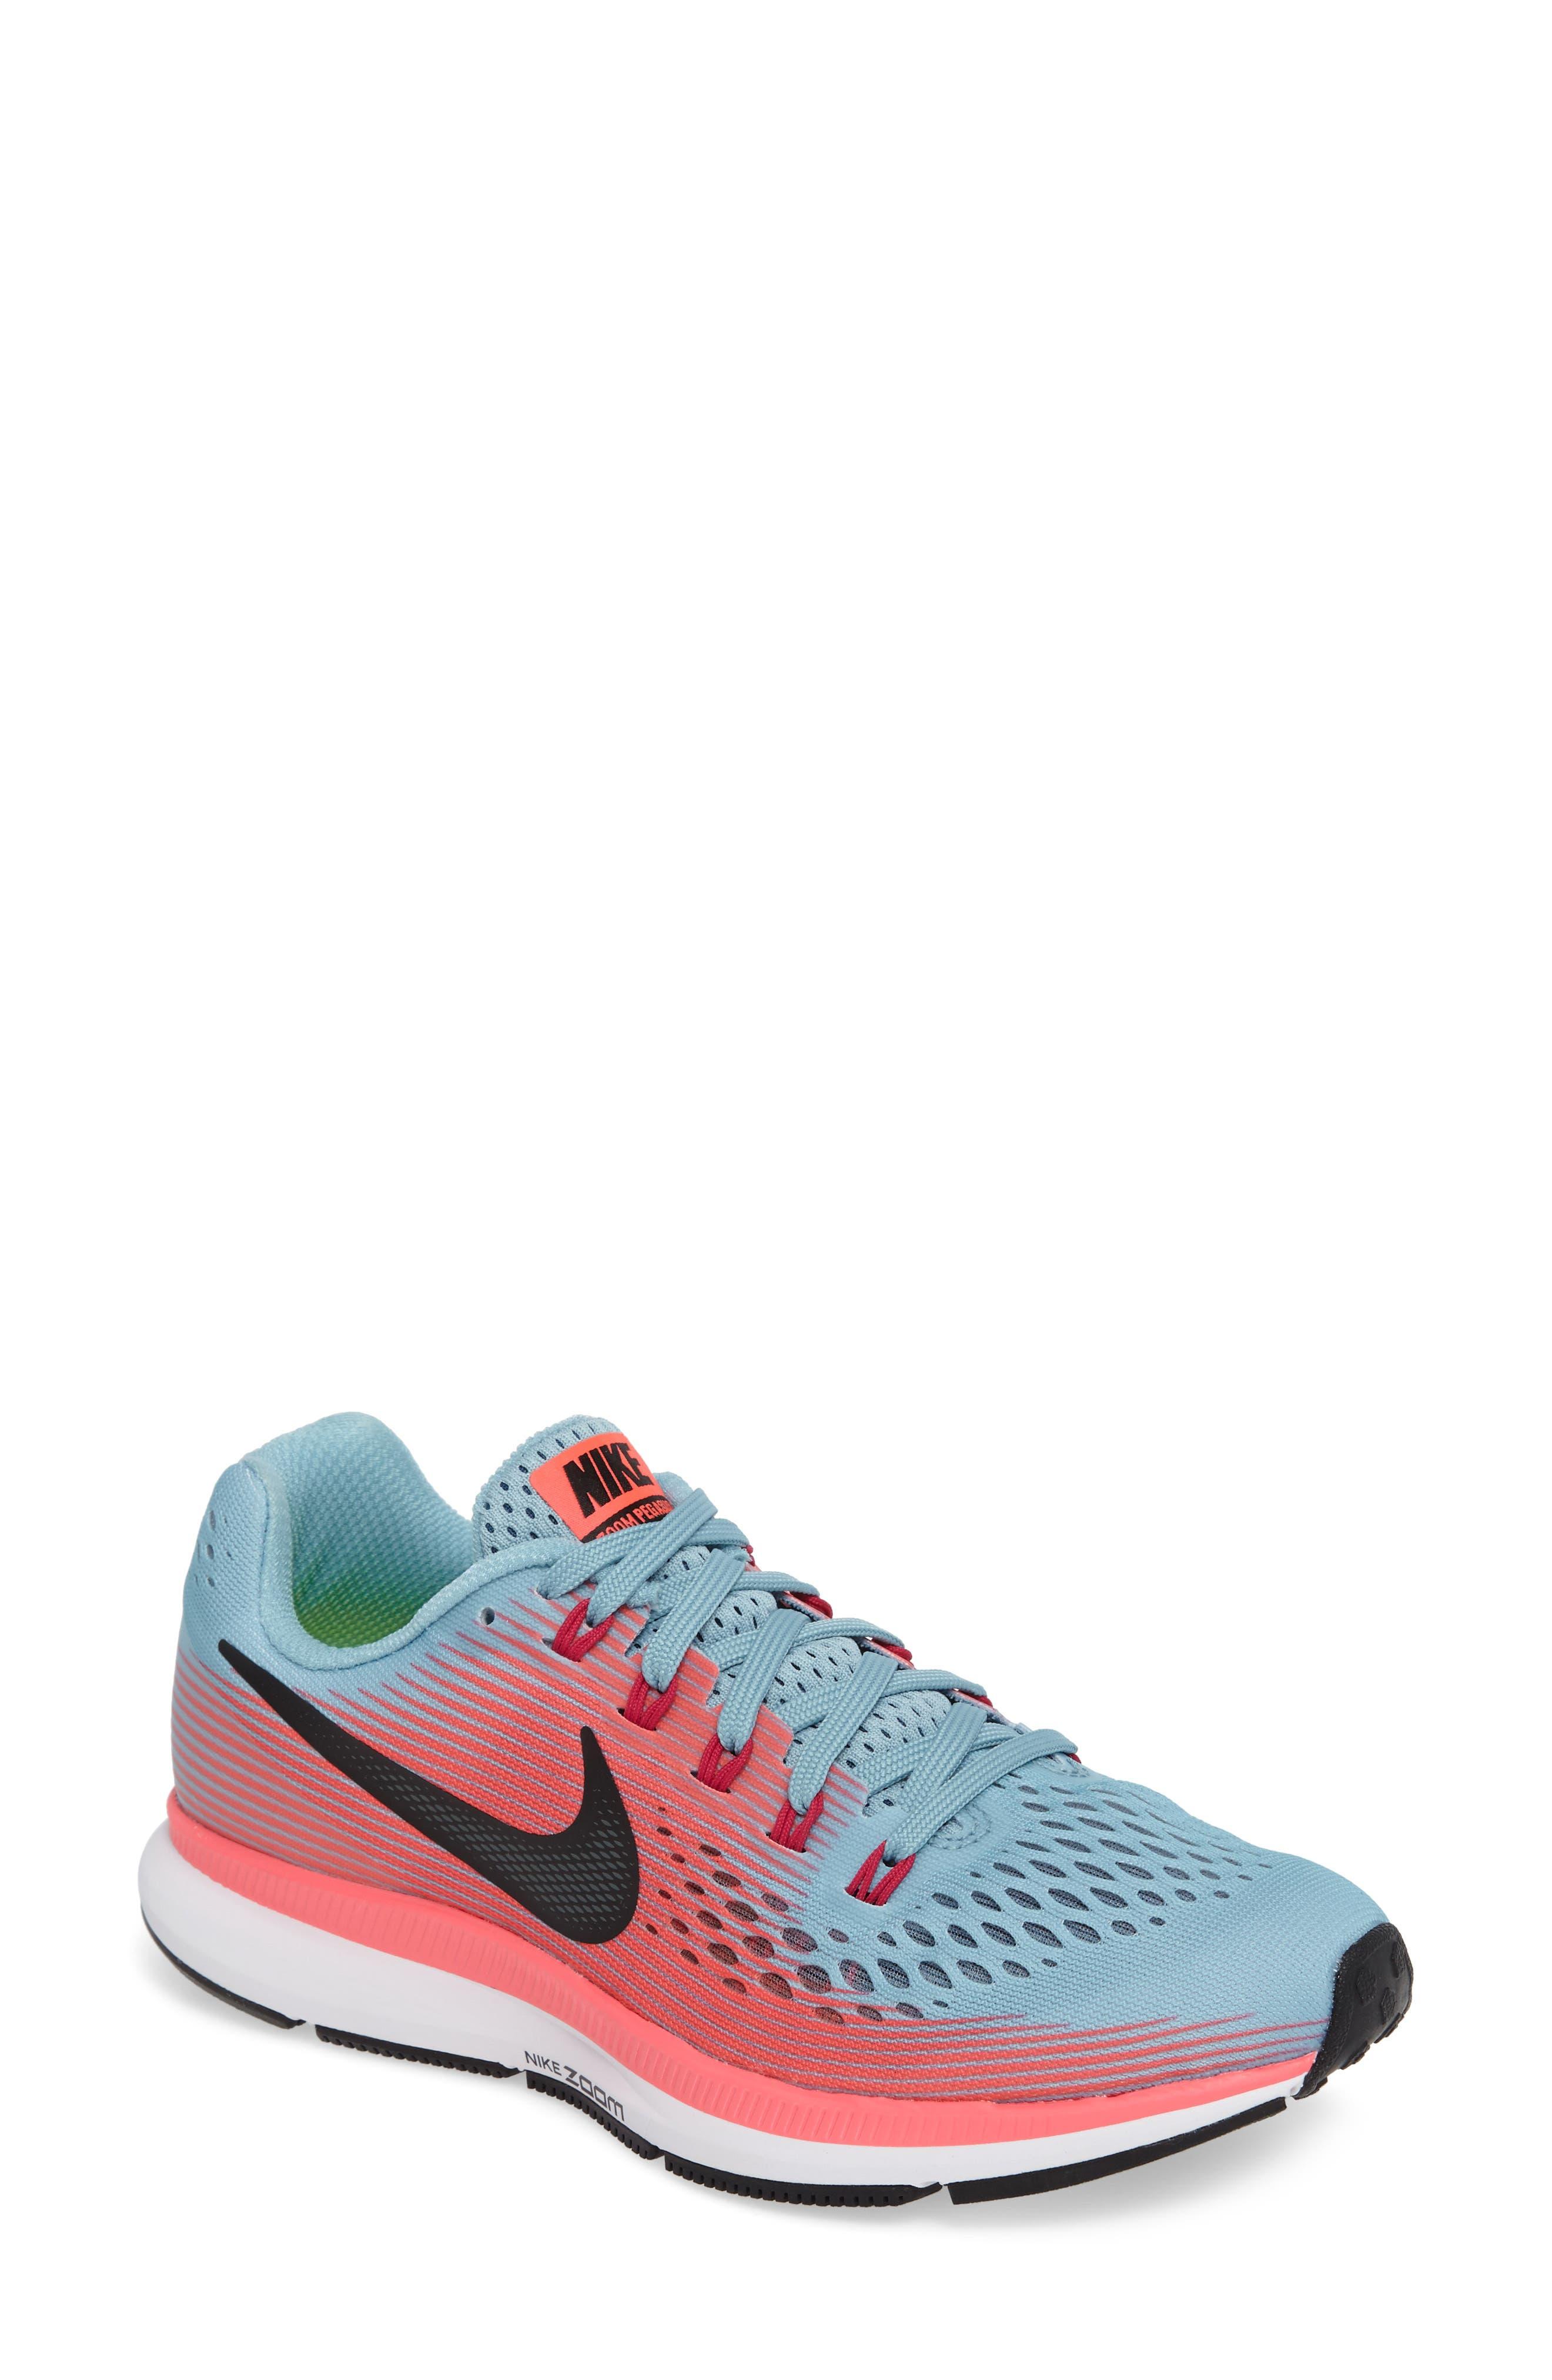 Air Zoom Pegasus 34 Running Shoe,                         Main,                         color, Blue/ White/ Pink/ Fuchsia